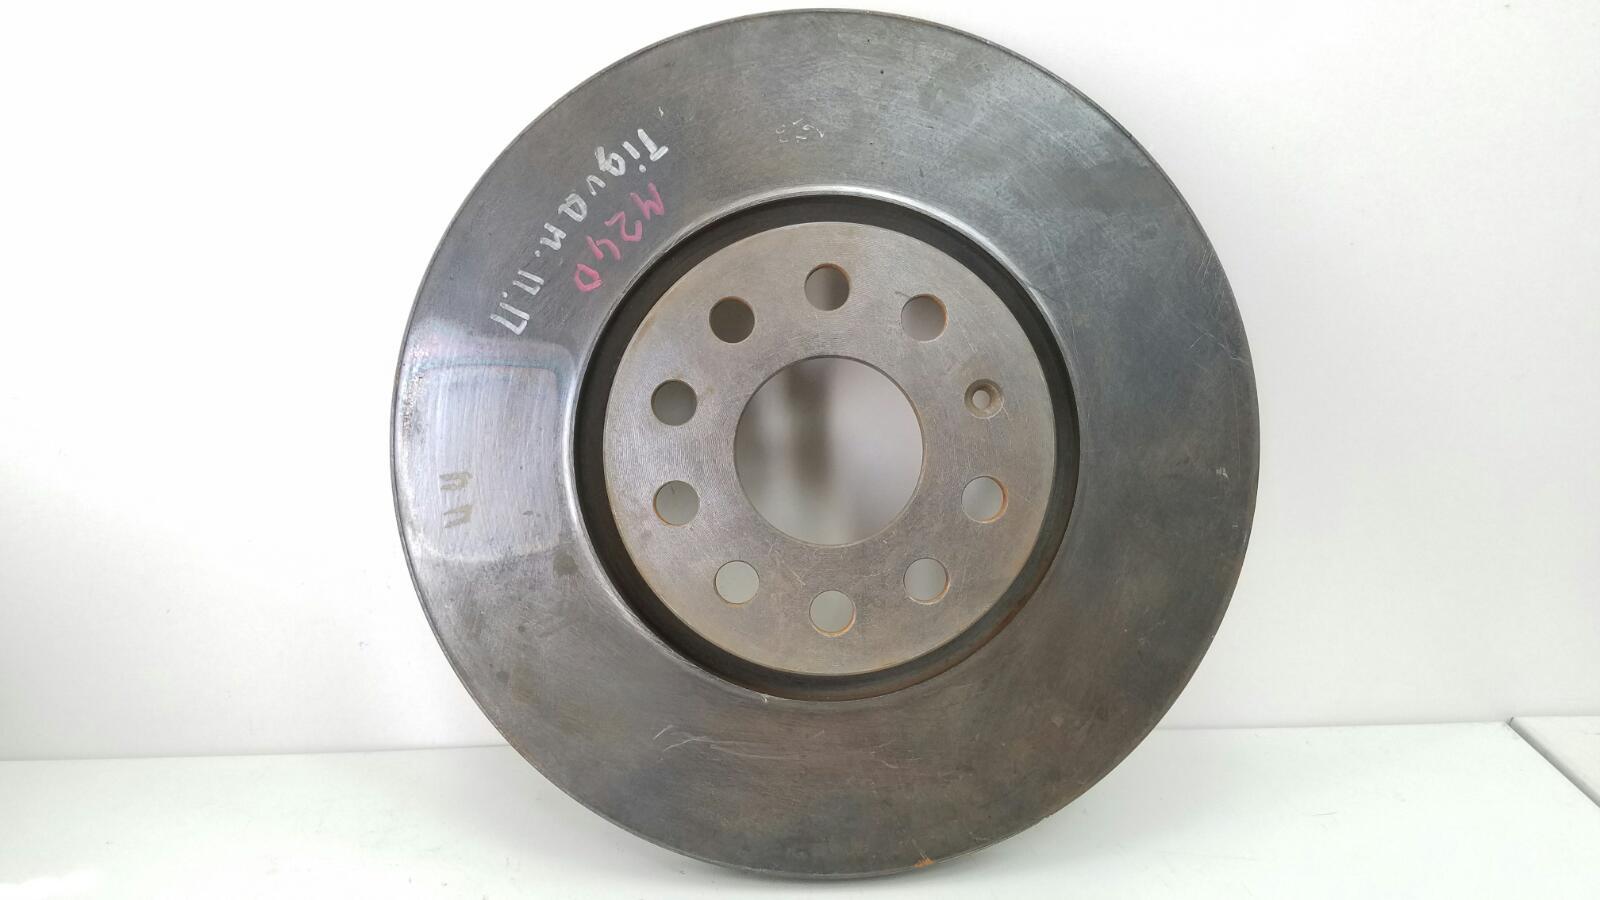 Тормозной диск Volkswagen Tiguan 5N1 CAWA 2.0Л TSI 4MOTION 2013 передний правый